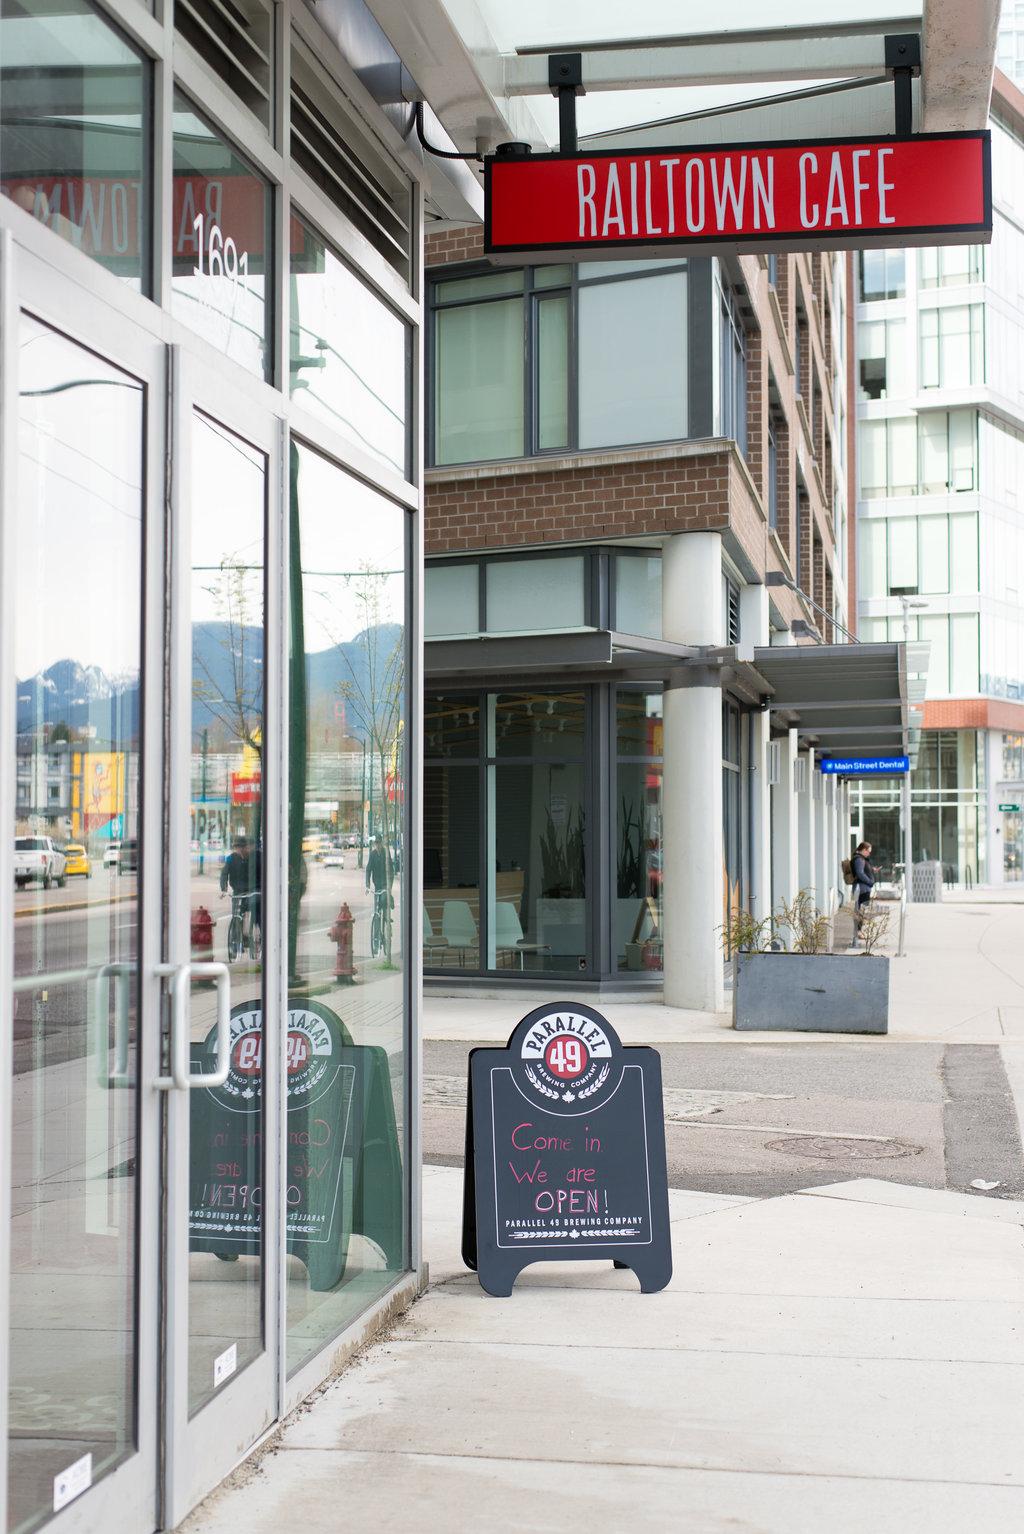 Railtown Café   cafe   1691 Main St, Vancouver, BC V6A 2W5, Canada   6043362251 OR +1 604-336-2251